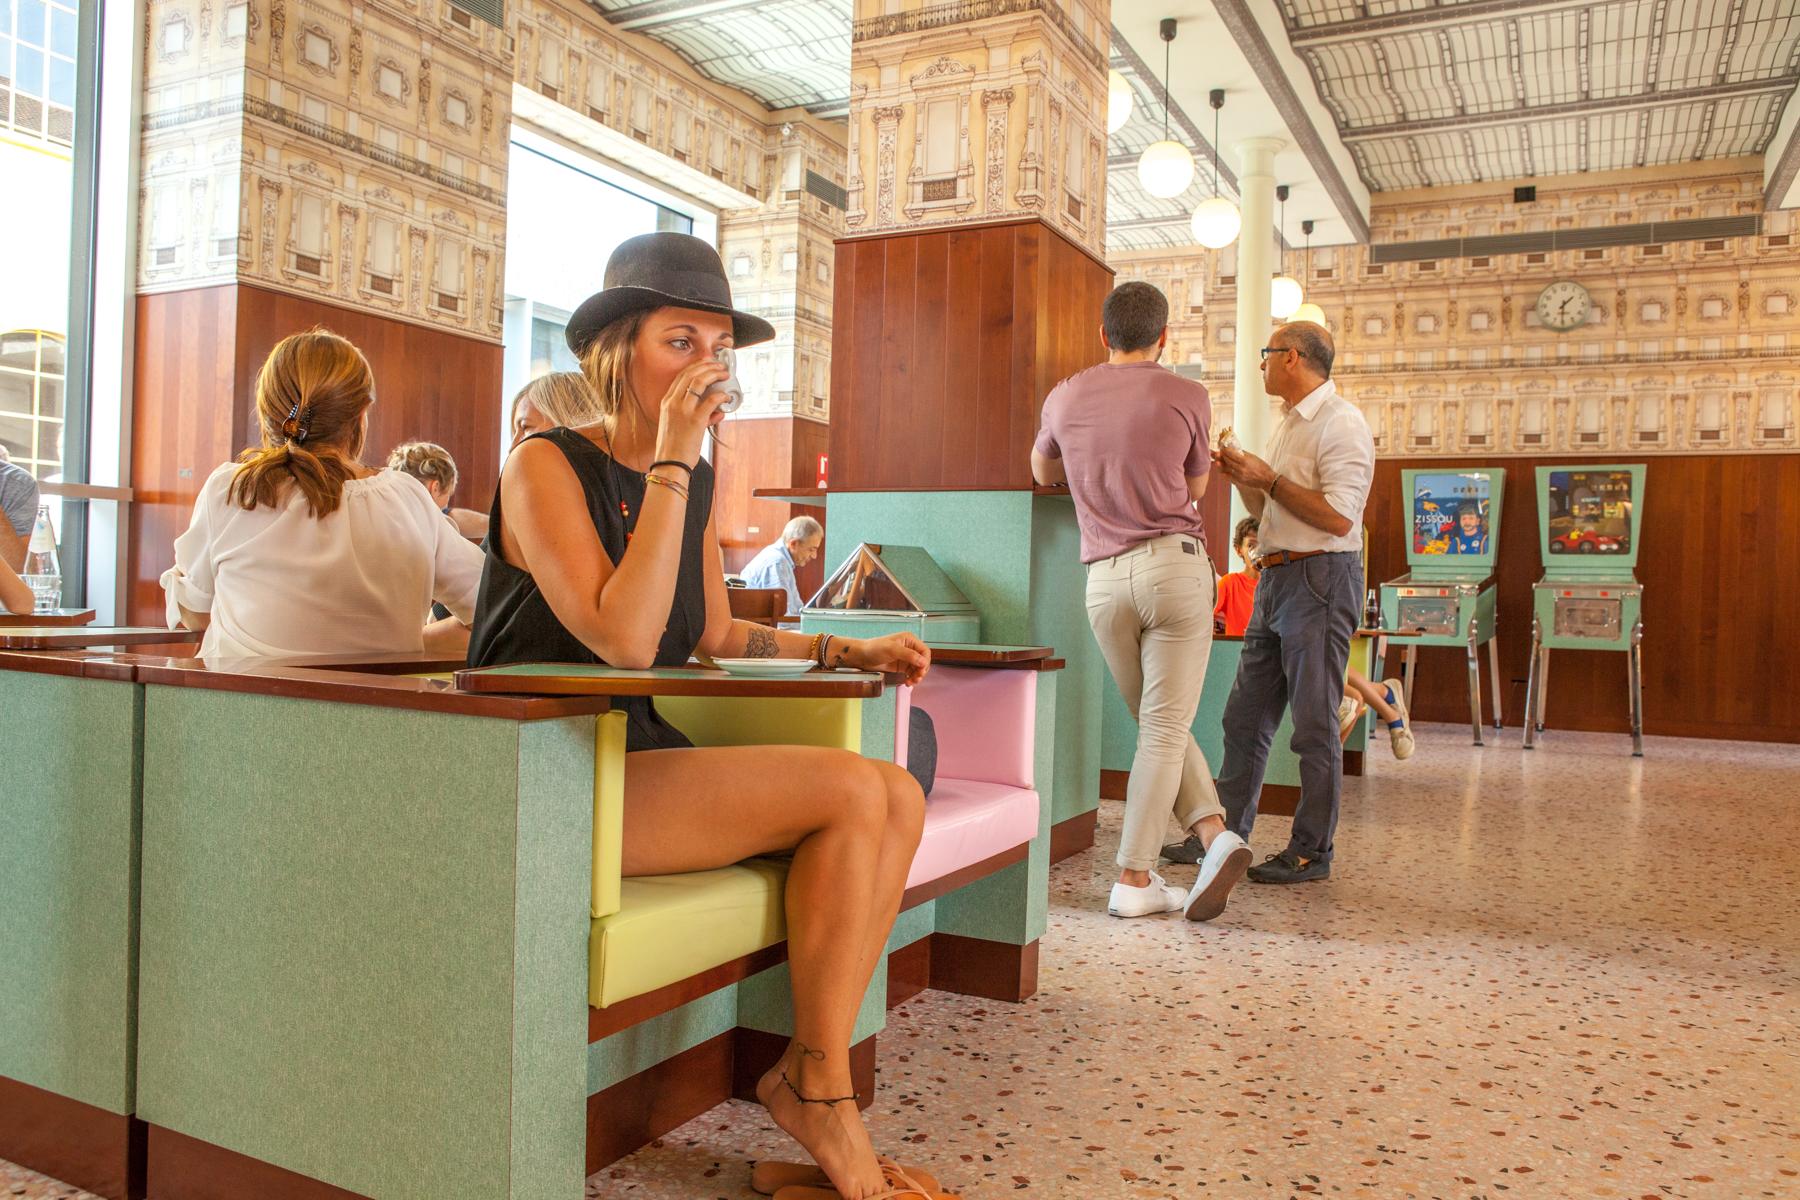 milan-voyage-café-fondation-prada-waynabox